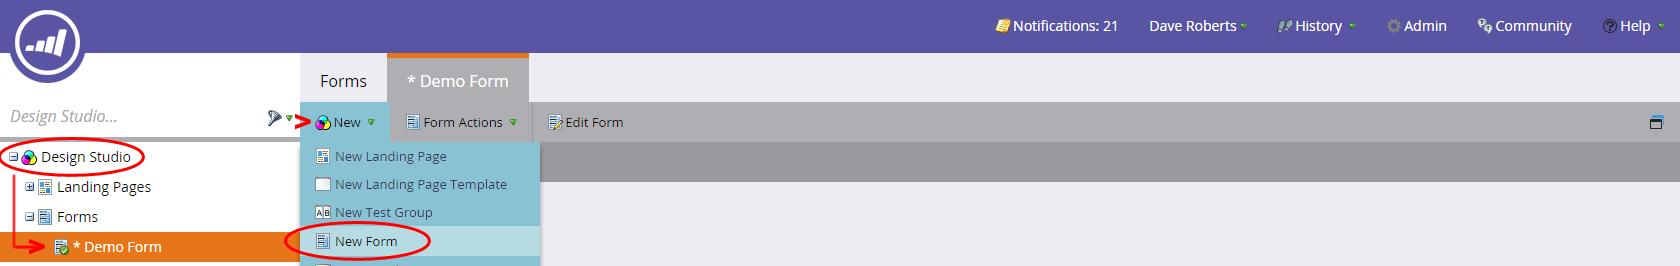 ScreenShots-Marketo-1-AddForm